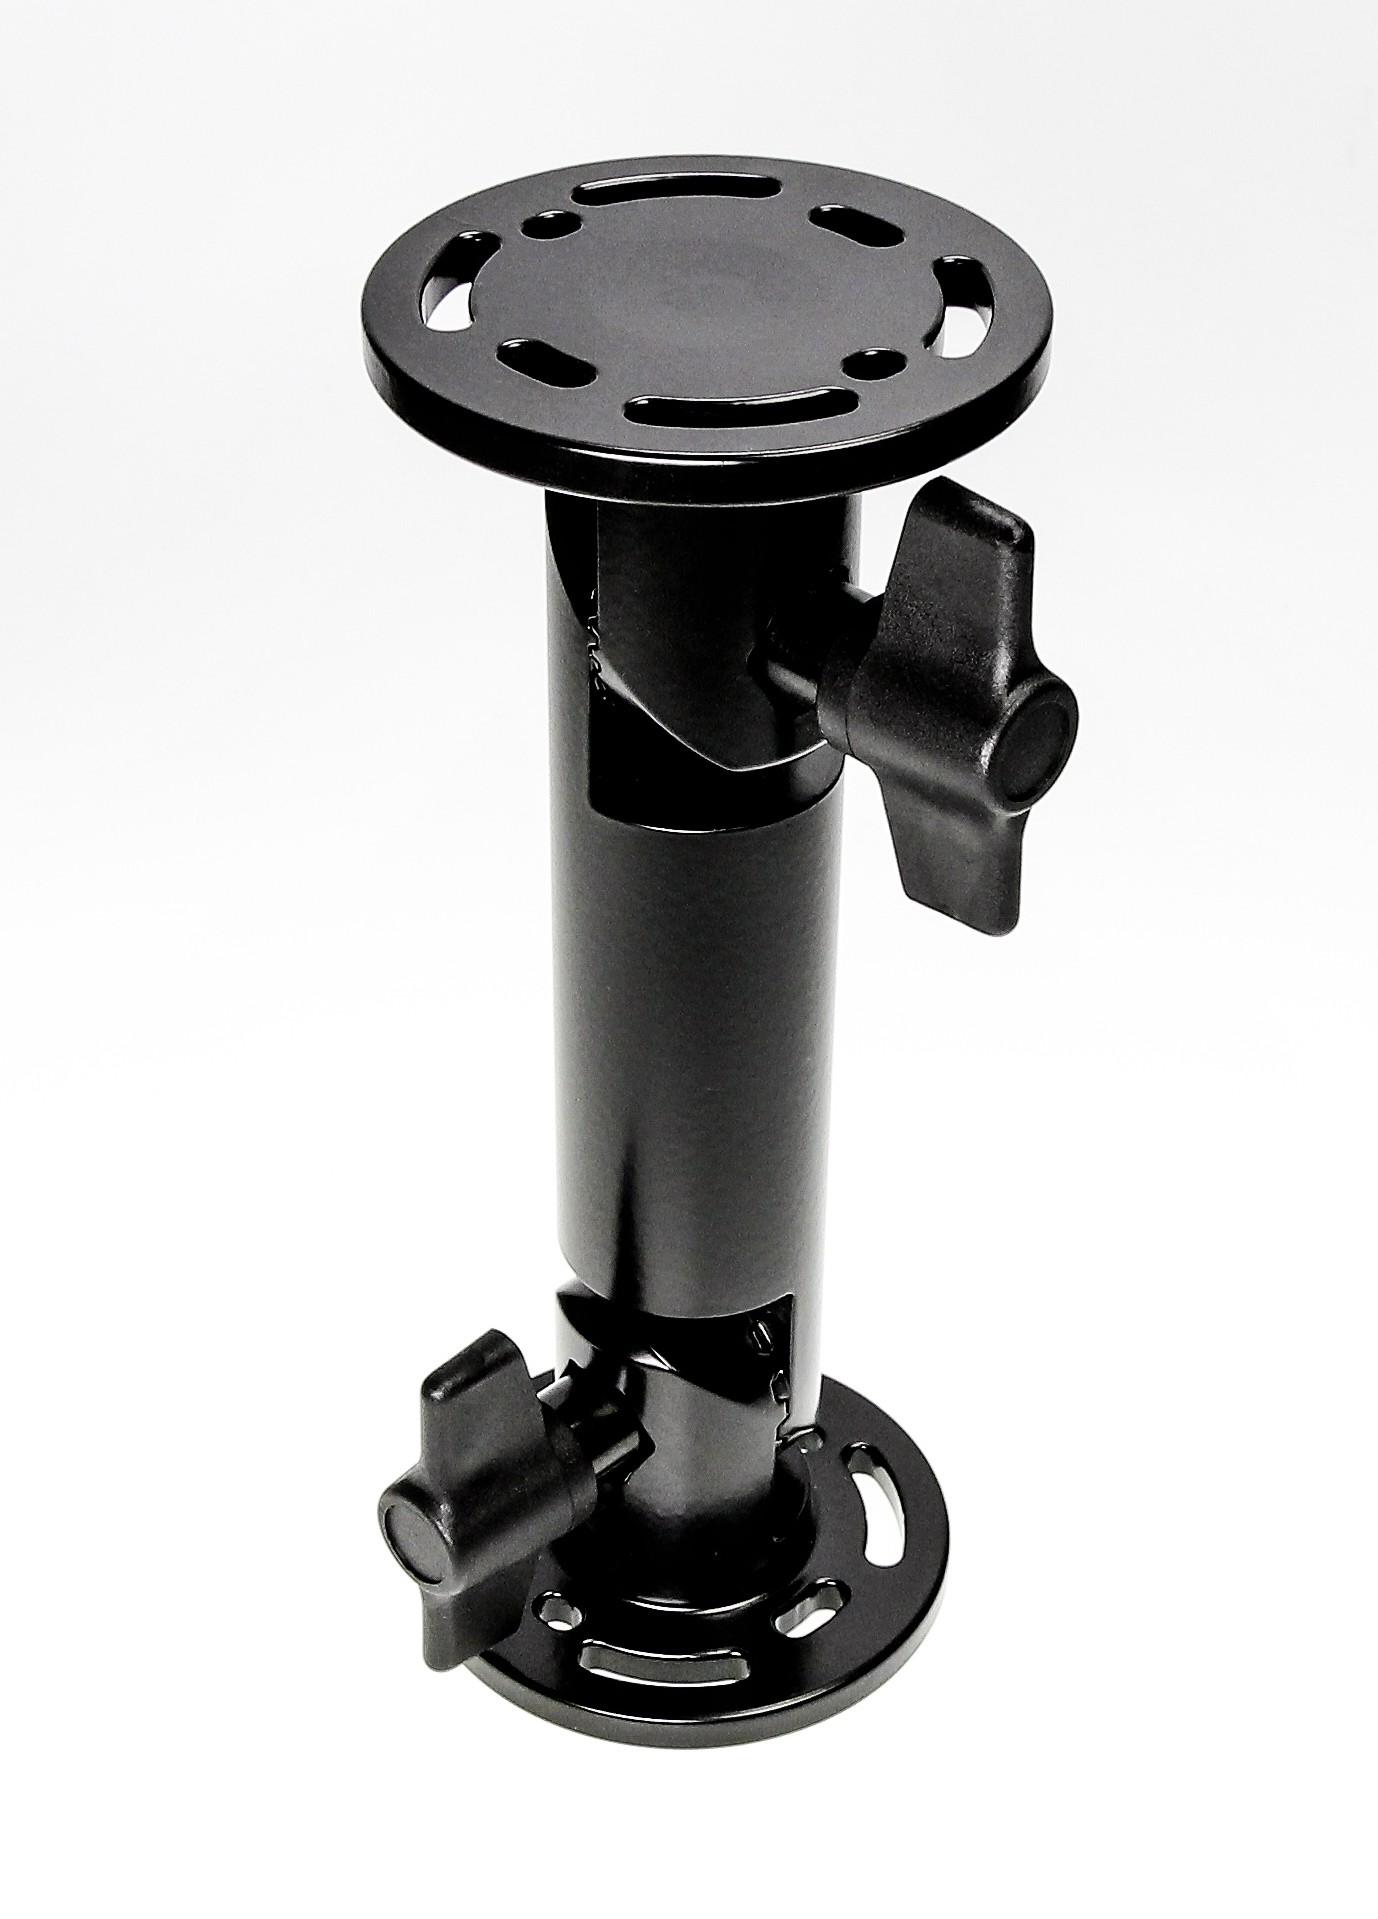 "Pedestal mount 8"", round base 64mm-small teeth-90° offset"